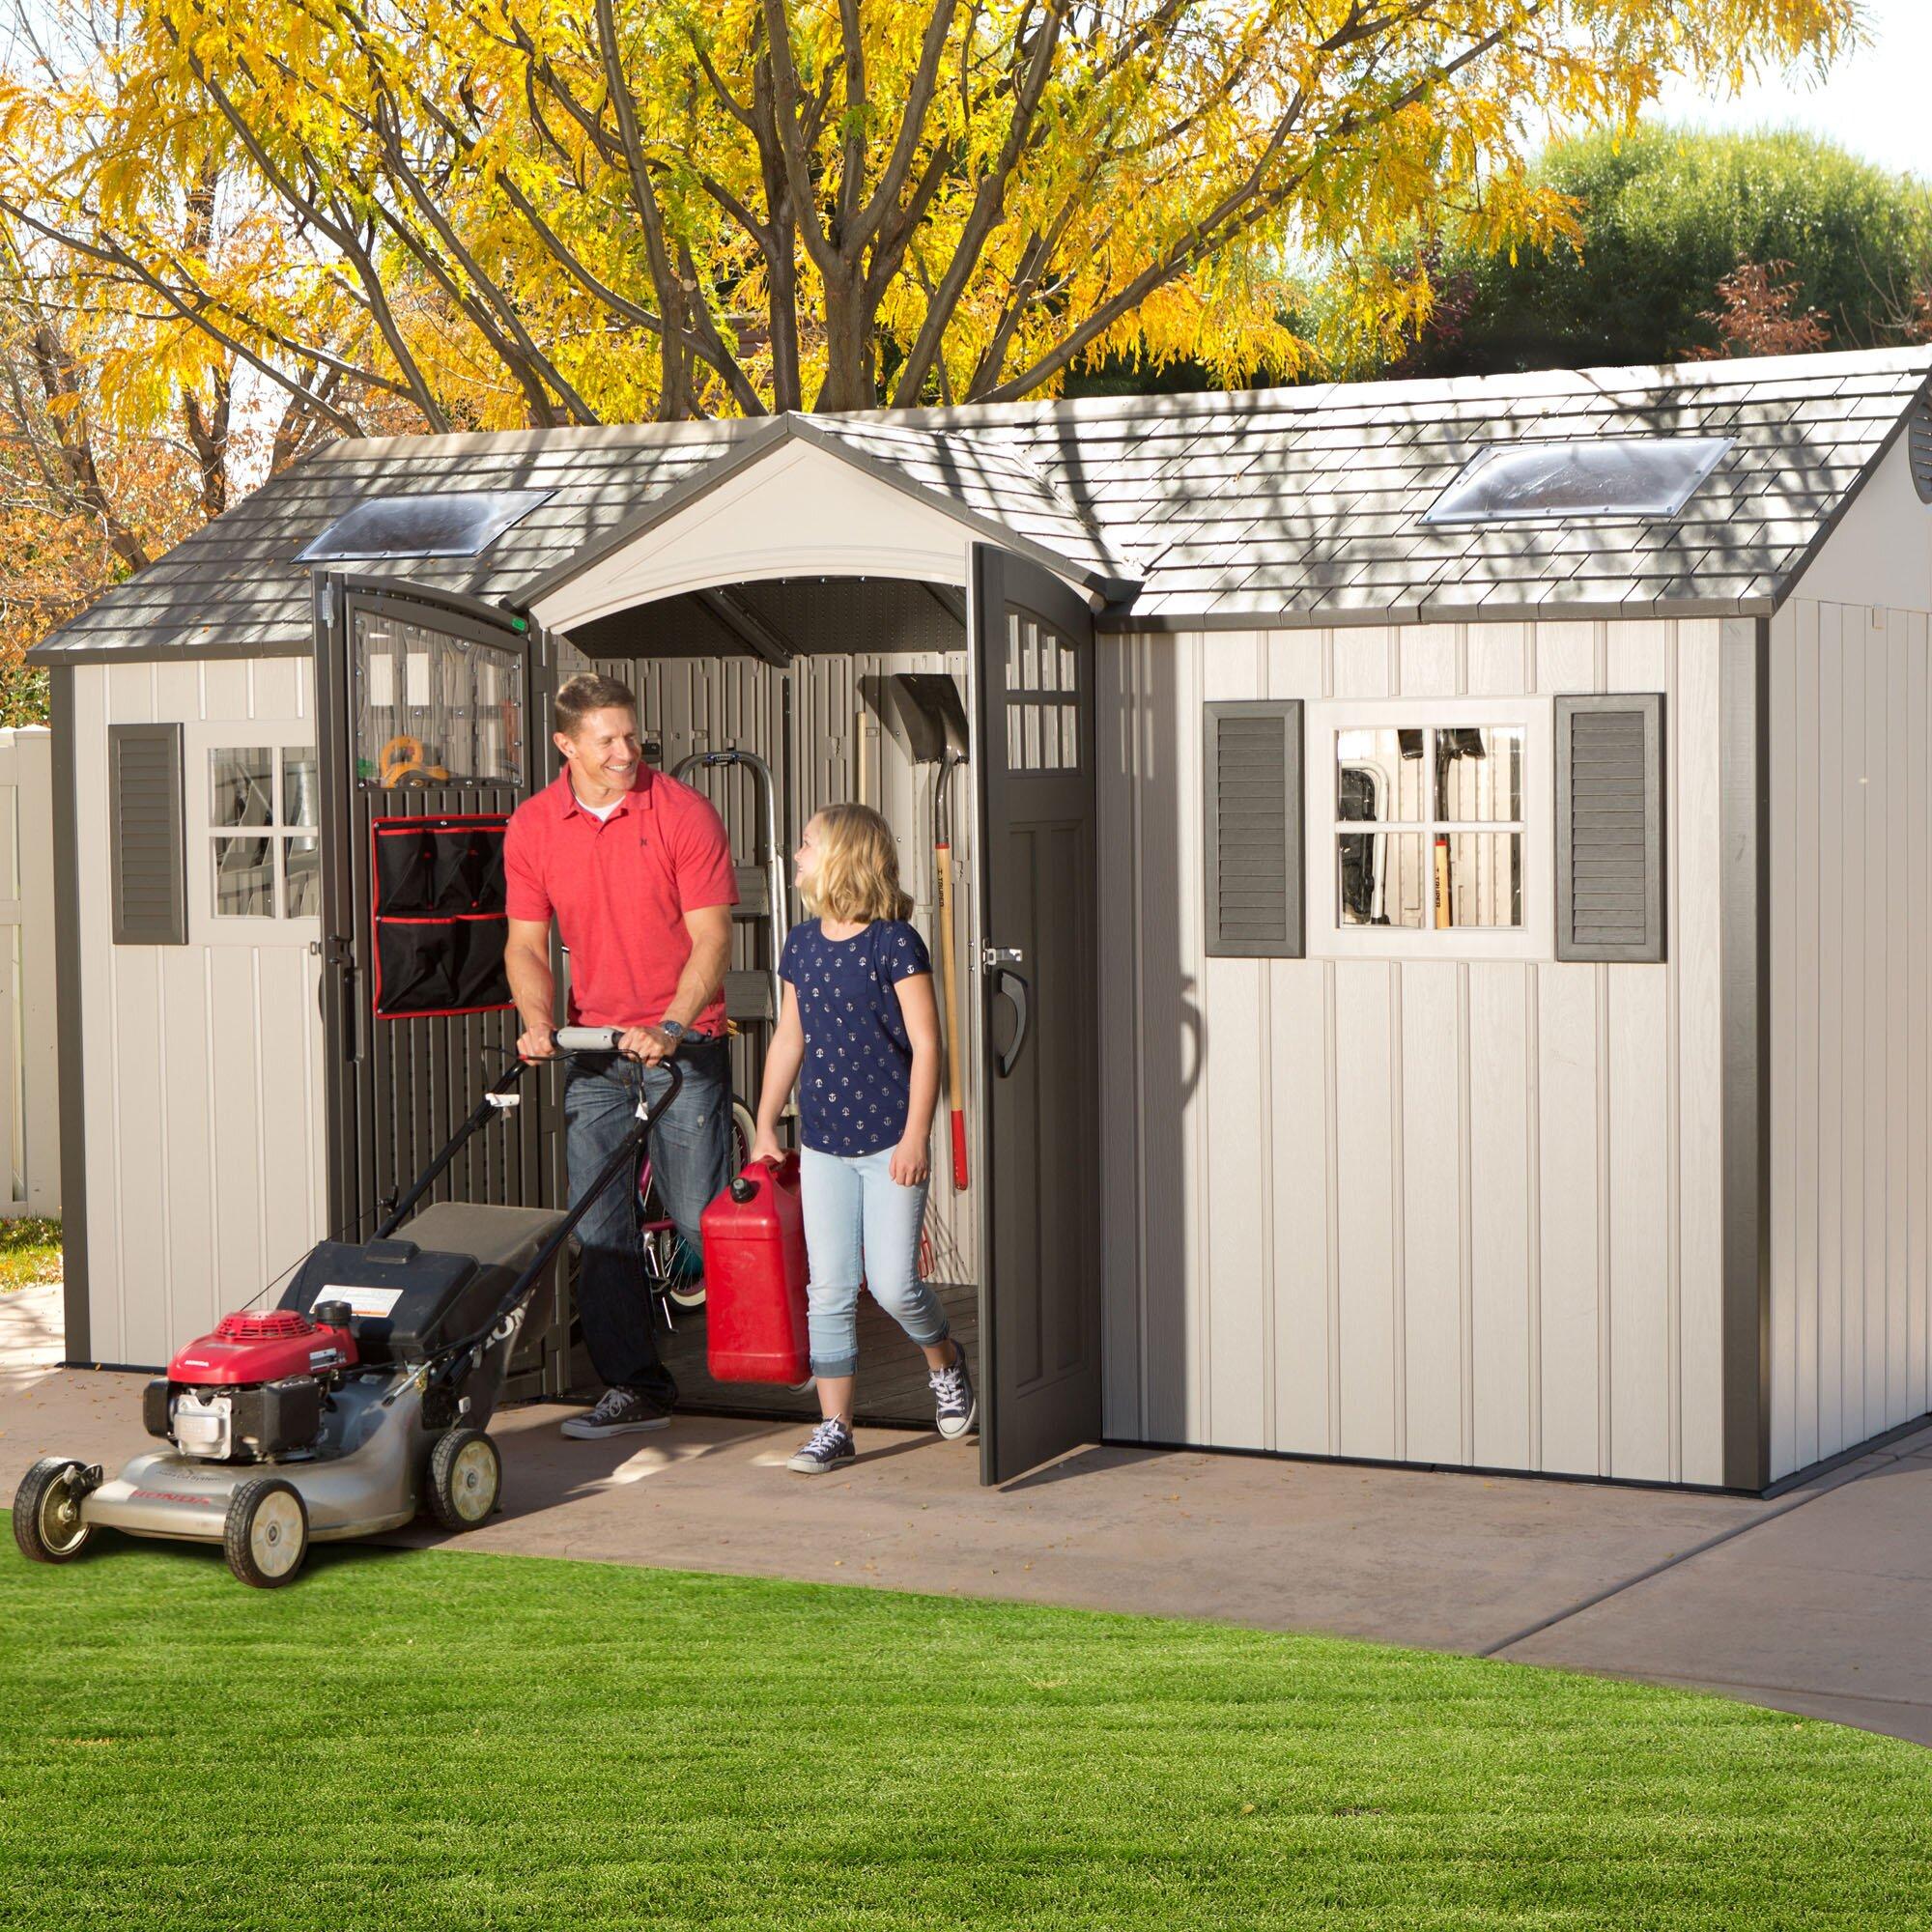 Outdoor Storage  Storage Sheds Lifetime Part #: 60138 SKU: LXT1332